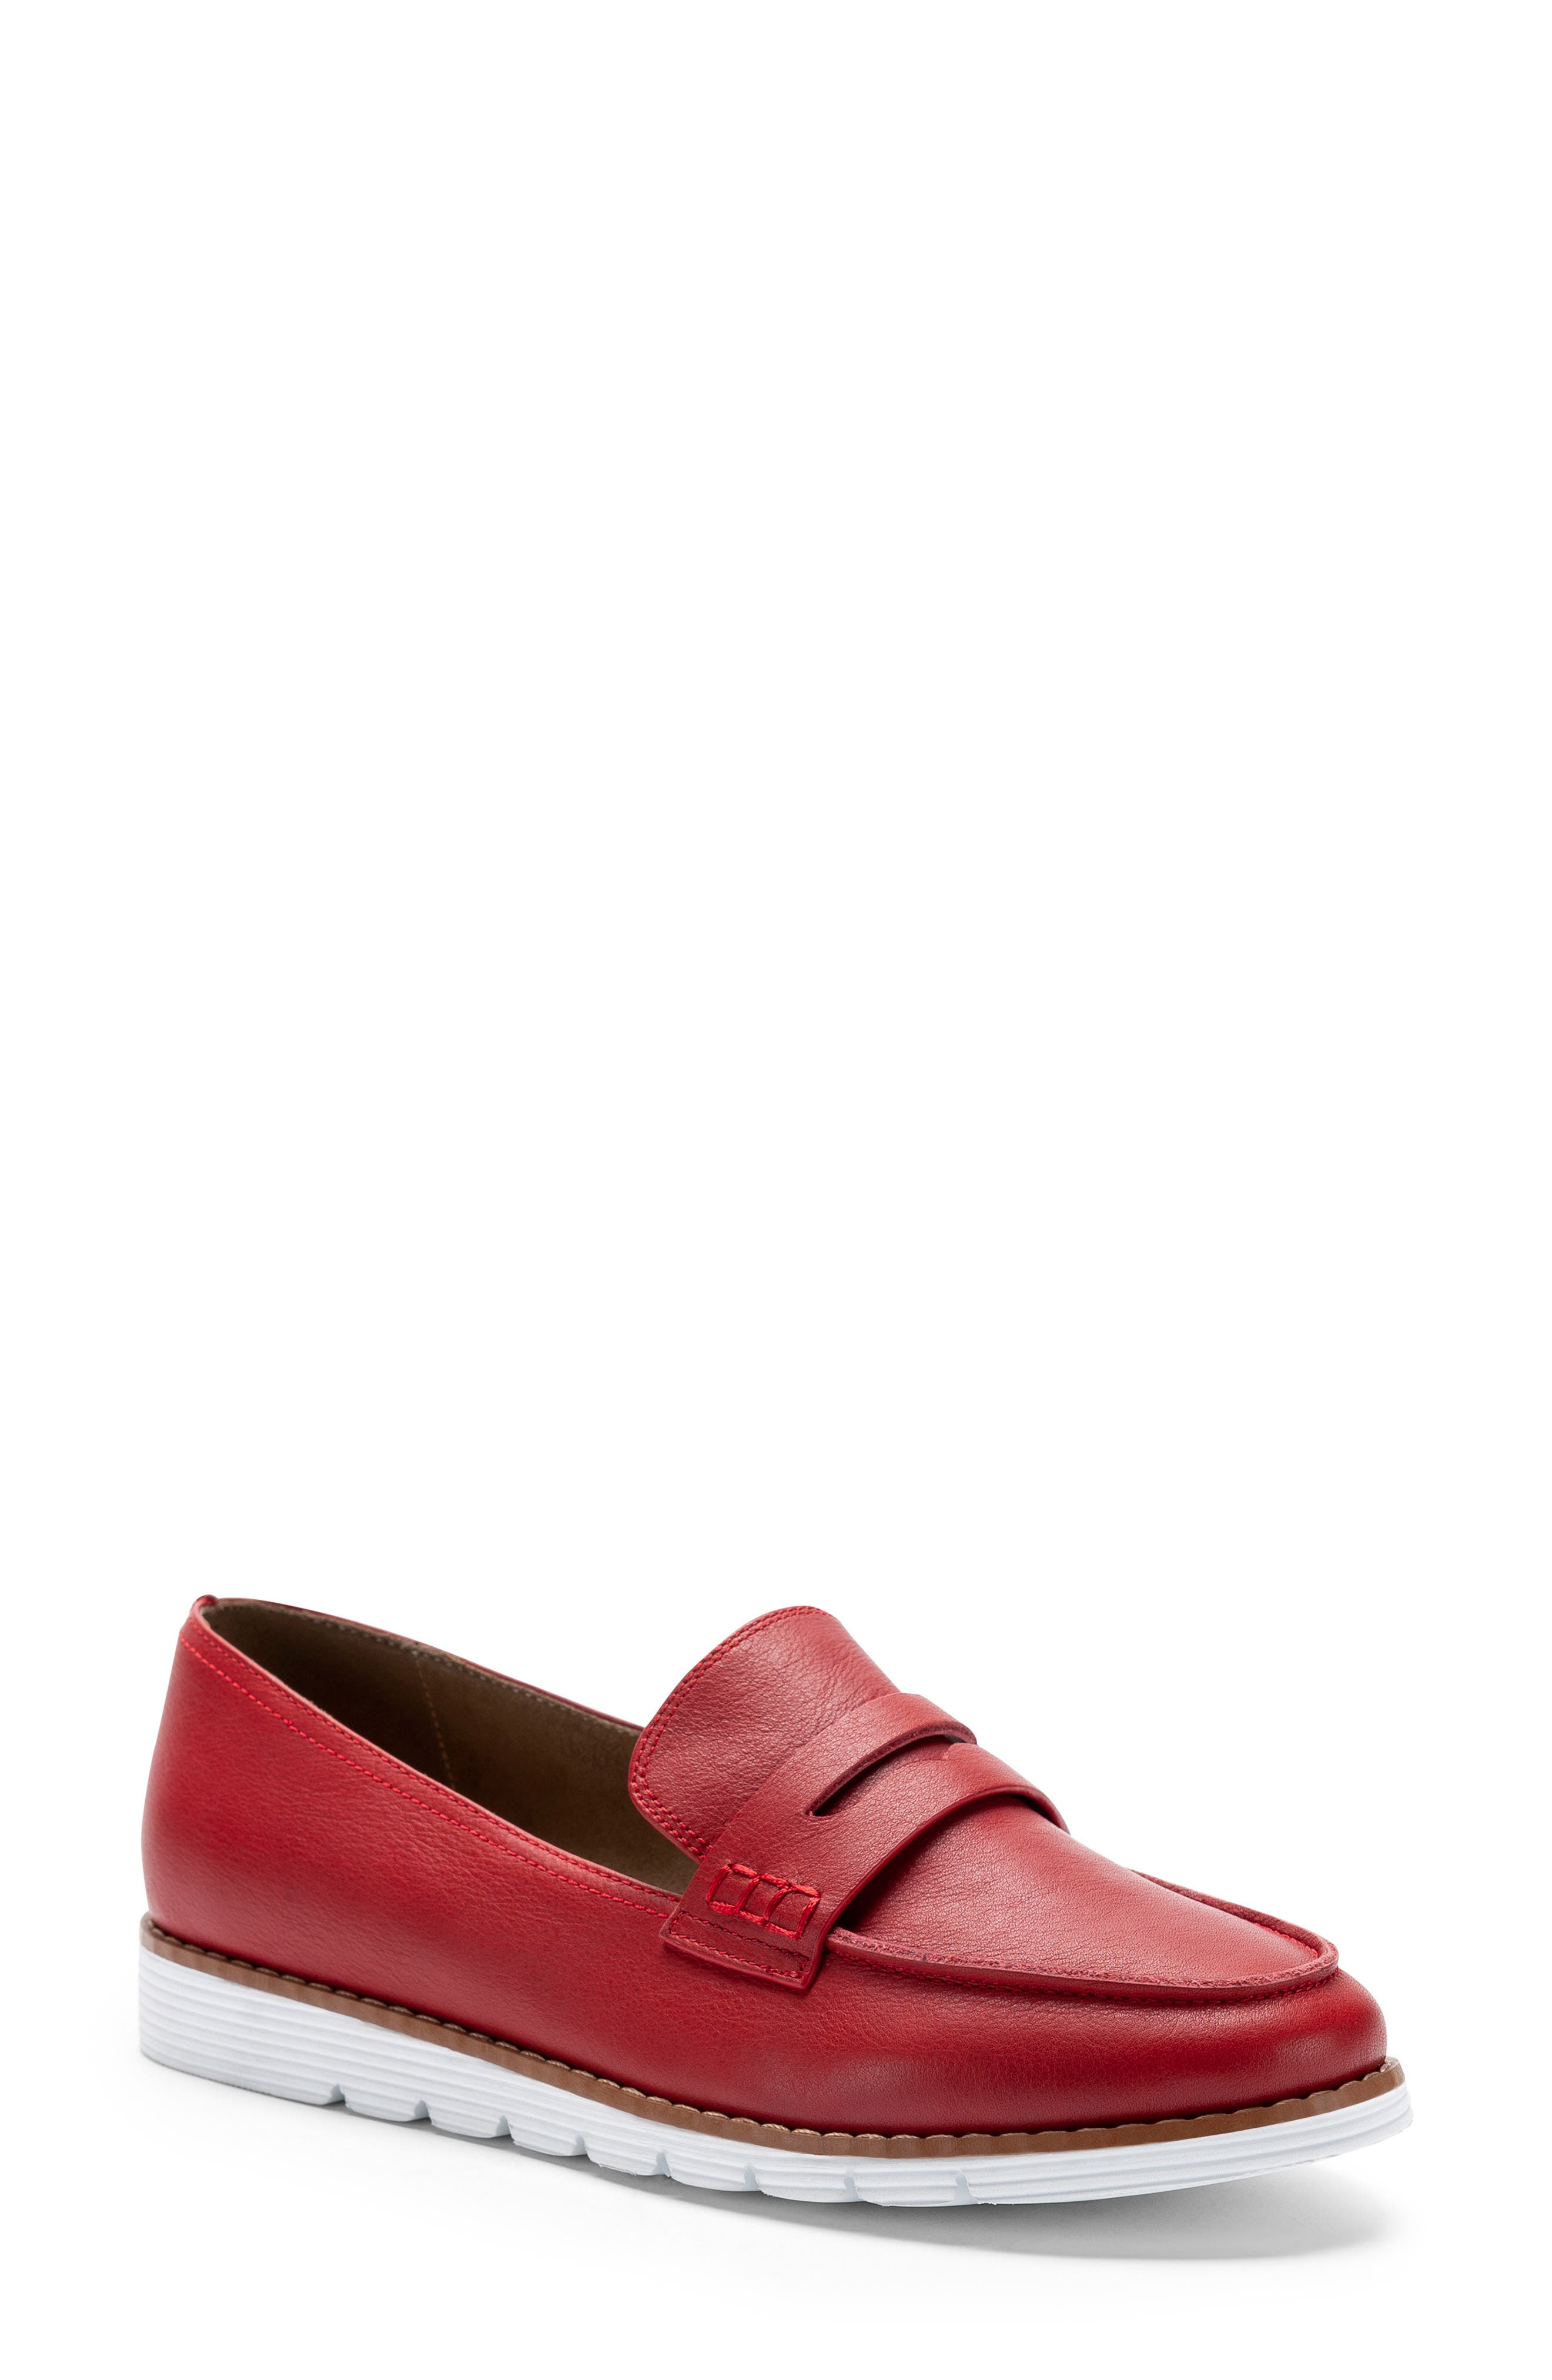 Blondo Waterproof Penny Loafer- Red